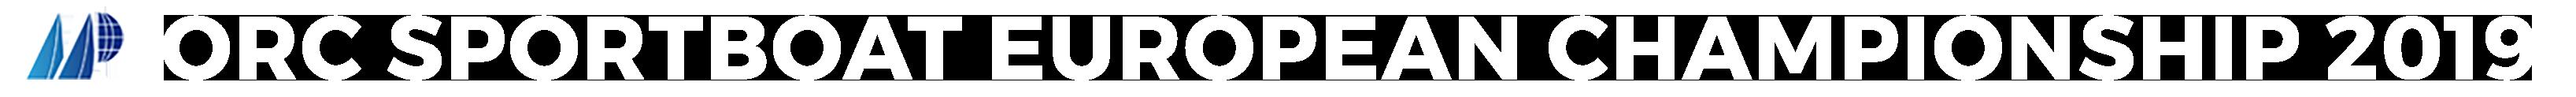 ORC SPORTBOAT EUROPEAN CHAMPIONSHIP 2019